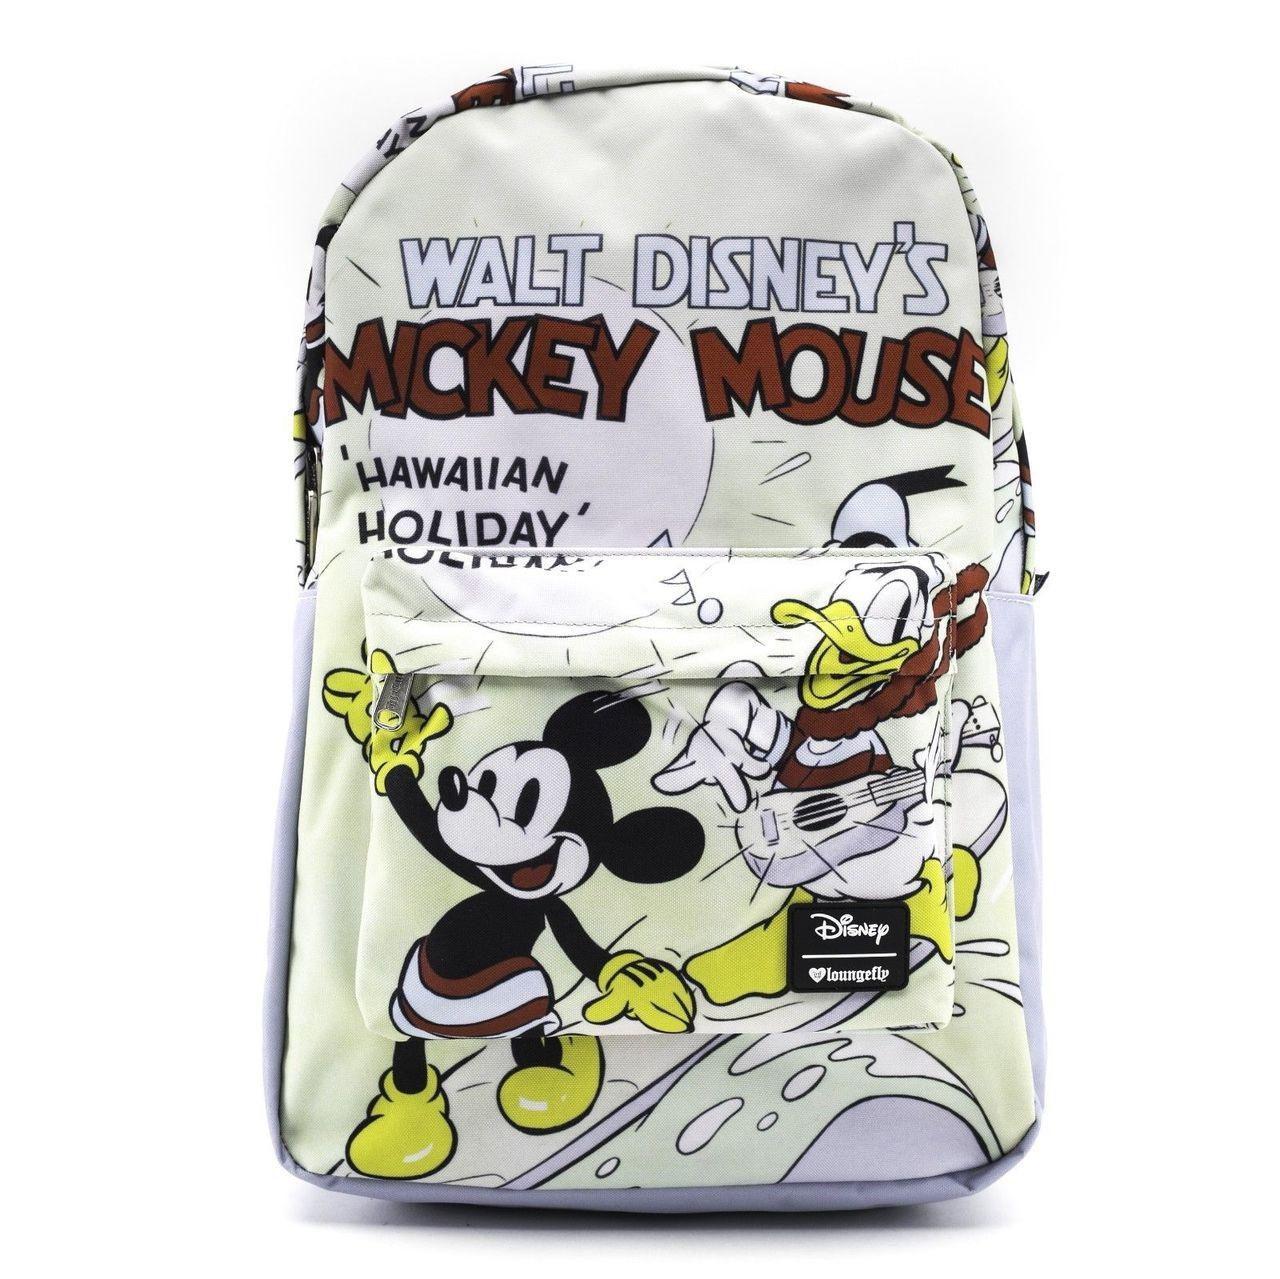 0d83612bf6e Loungefly Disney Mickey Mouse Donald Duck Hawaiian Holiday Backpack WDBK0498